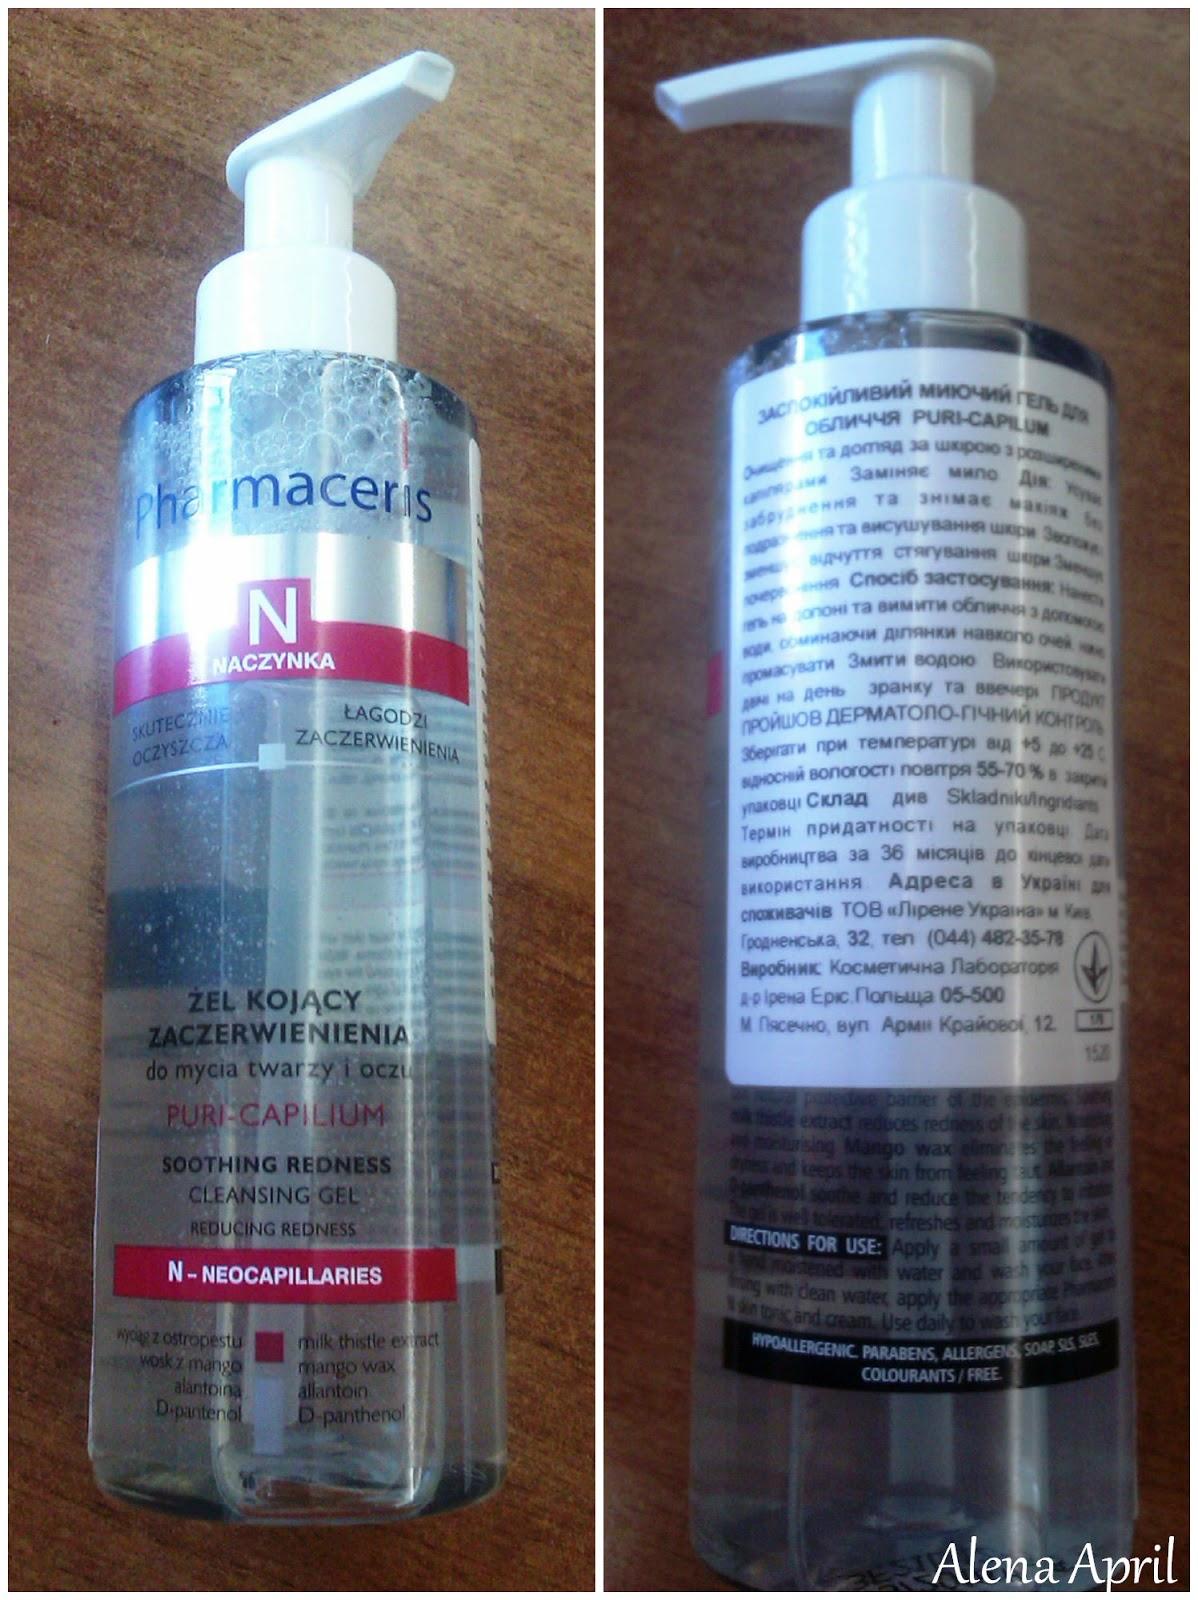 Pharmaceris N puri-capilium soothing cleansing gel, гель для умывания, для чувствительной кожи